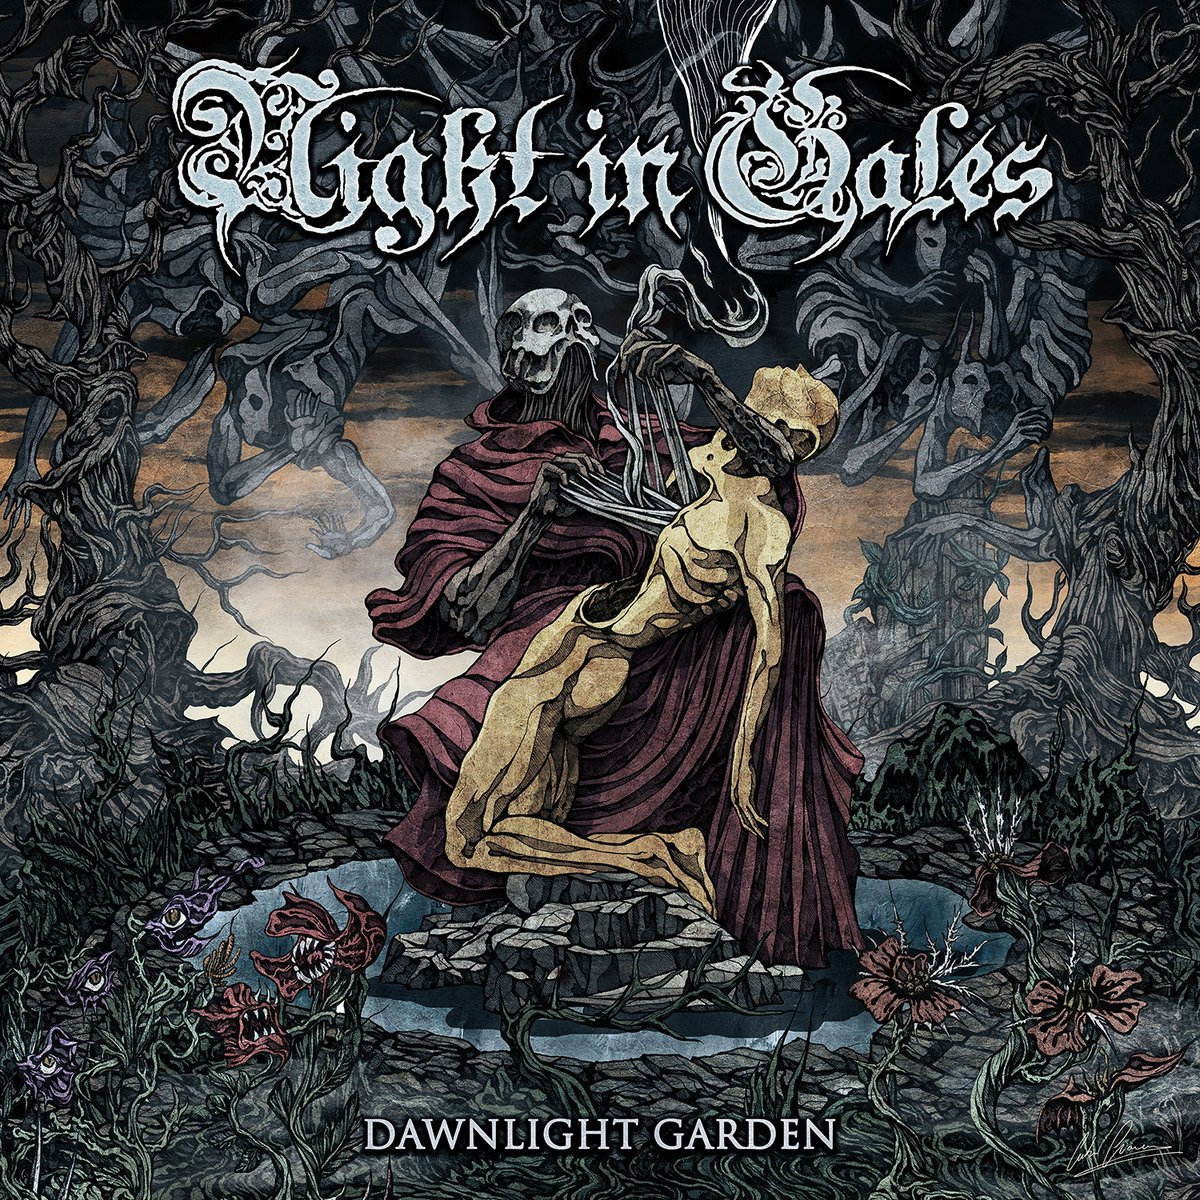 Night In Gales -Dawnlight Garden